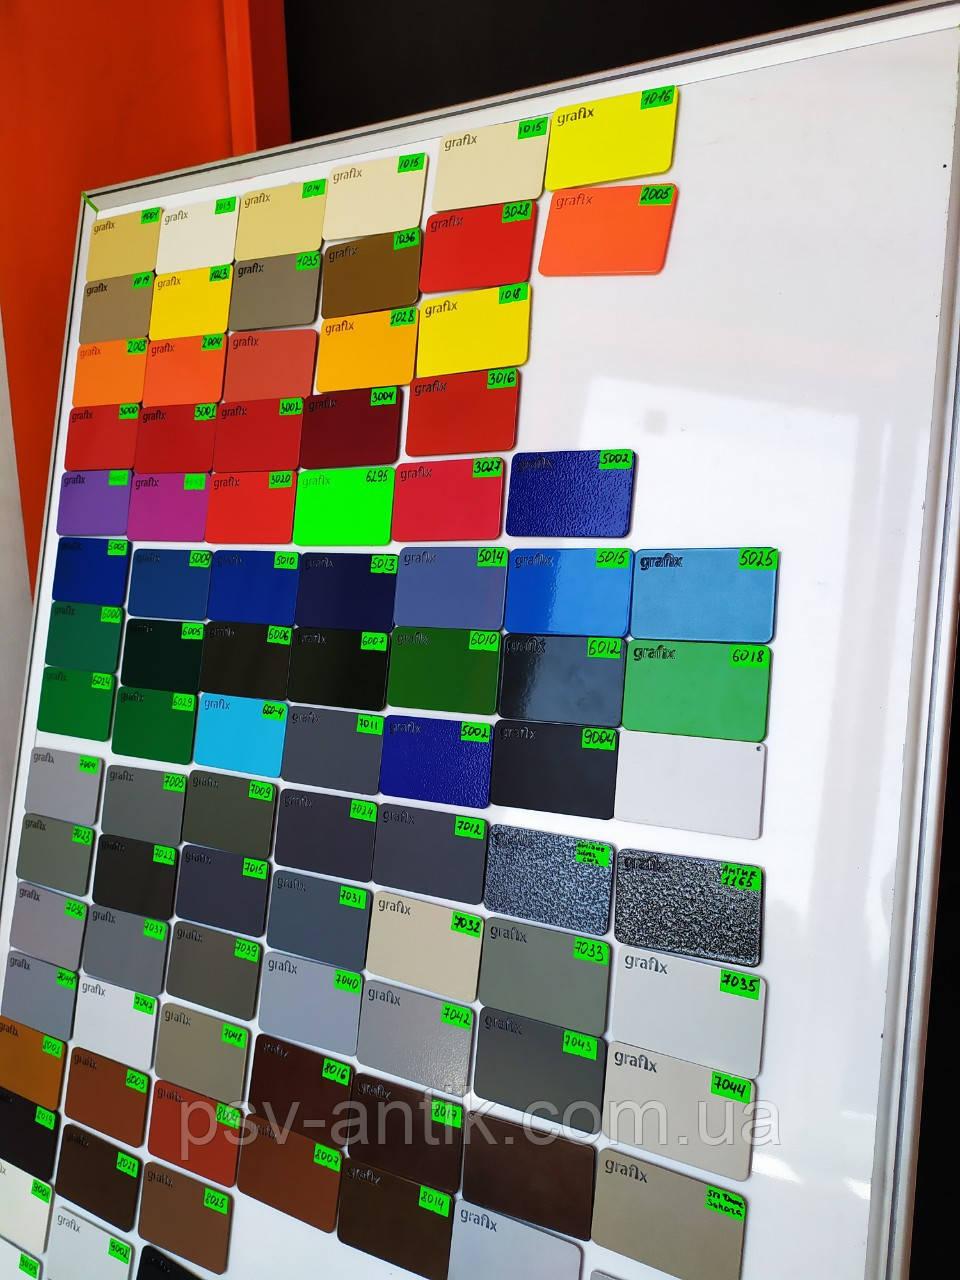 Порошковая краска глянцевая, полиэфирная, архитектурная, 7010